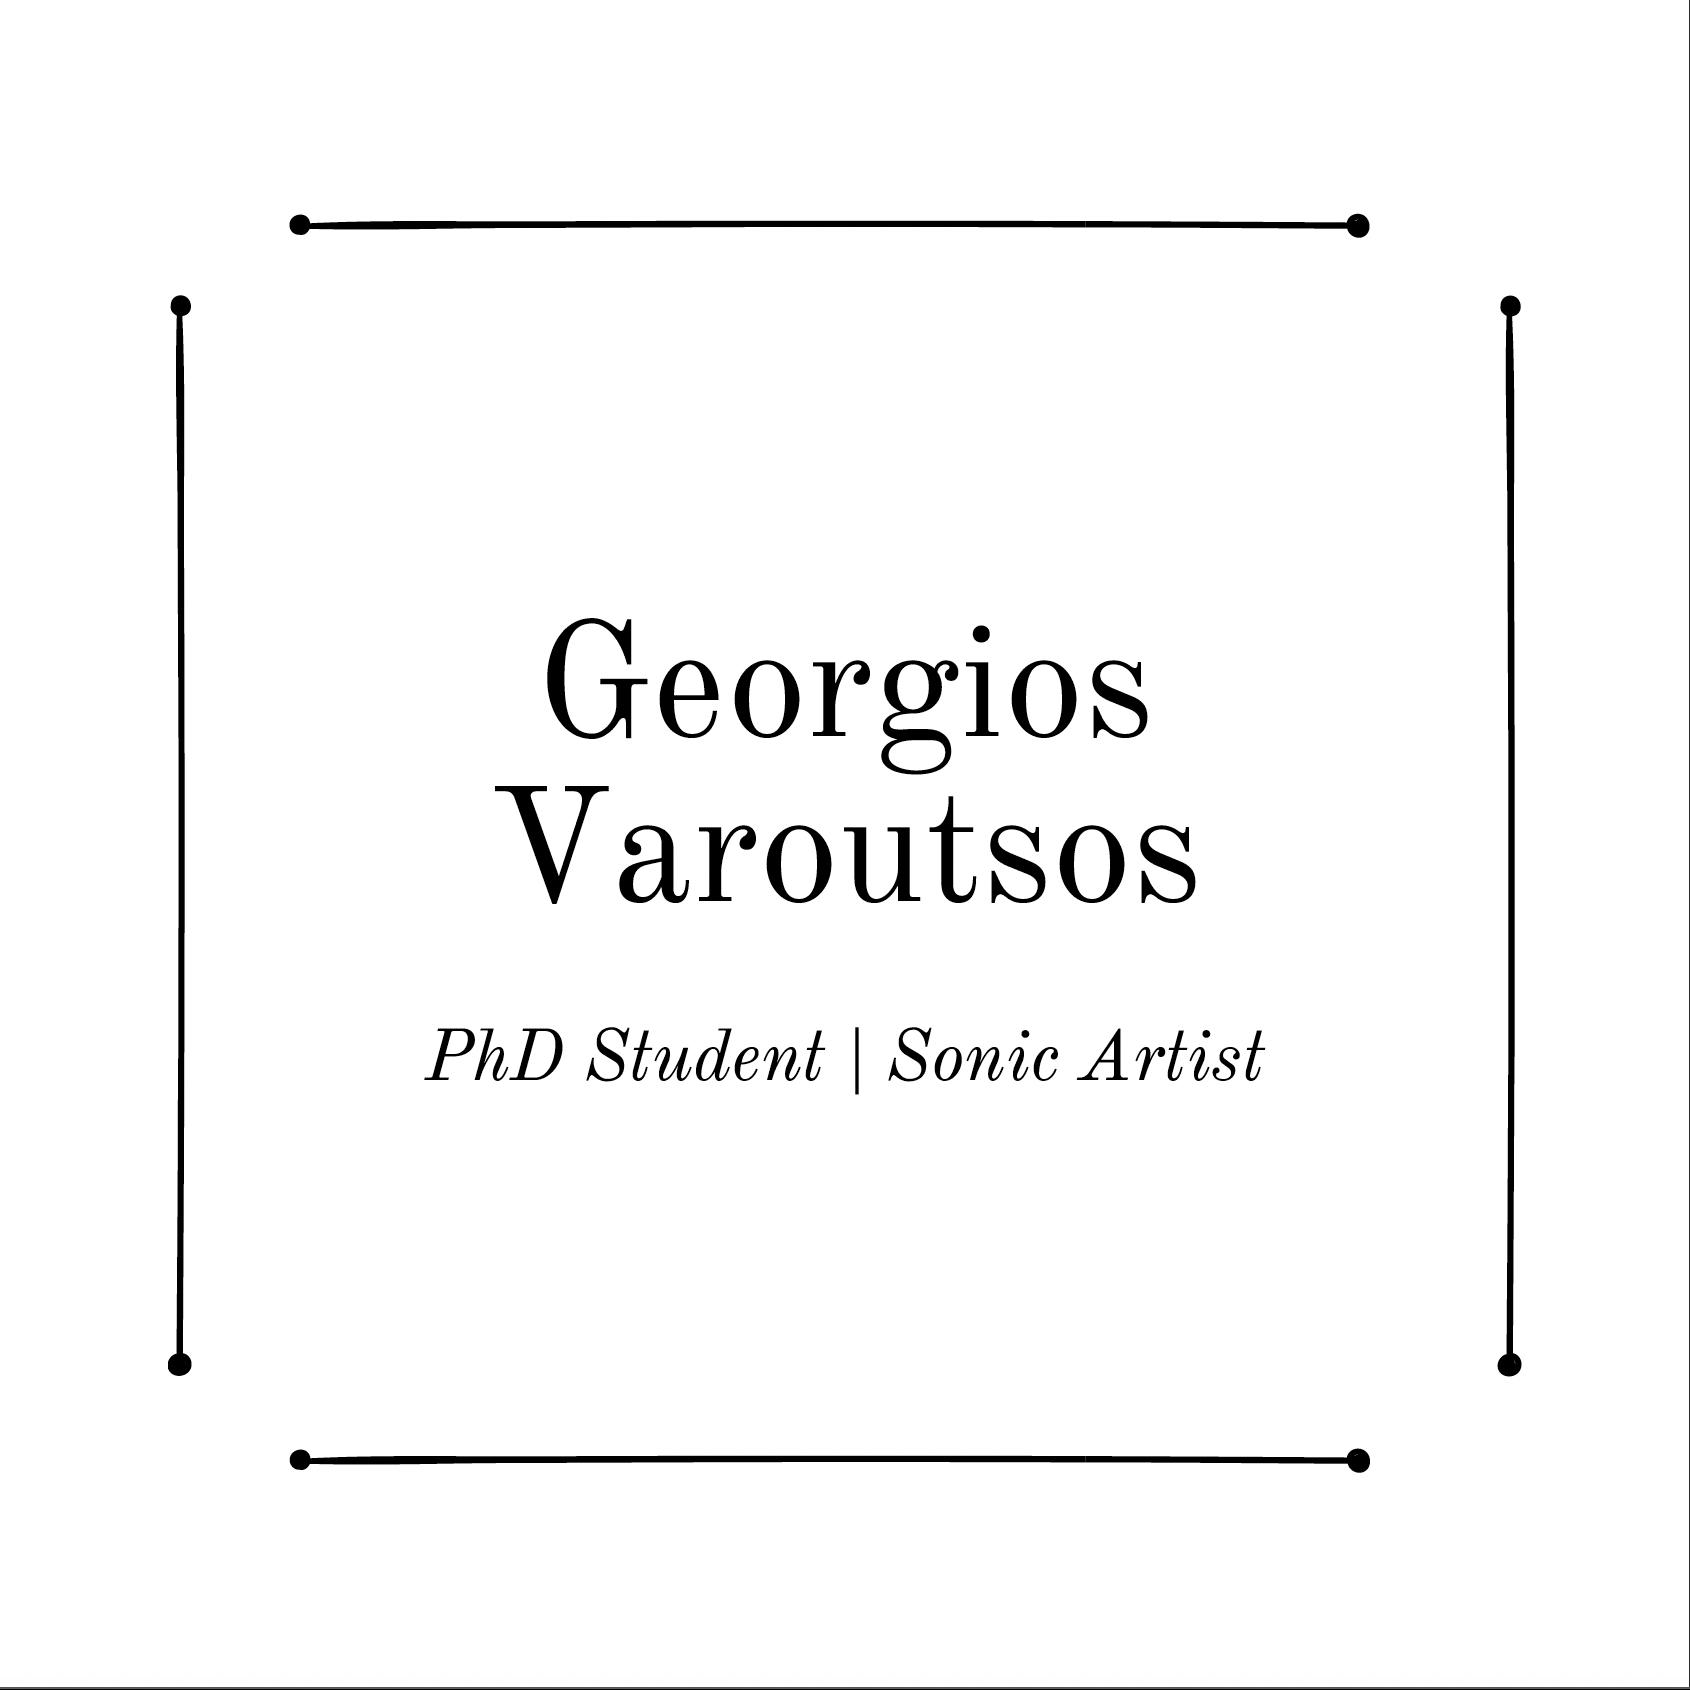 Georgios Varoutsos